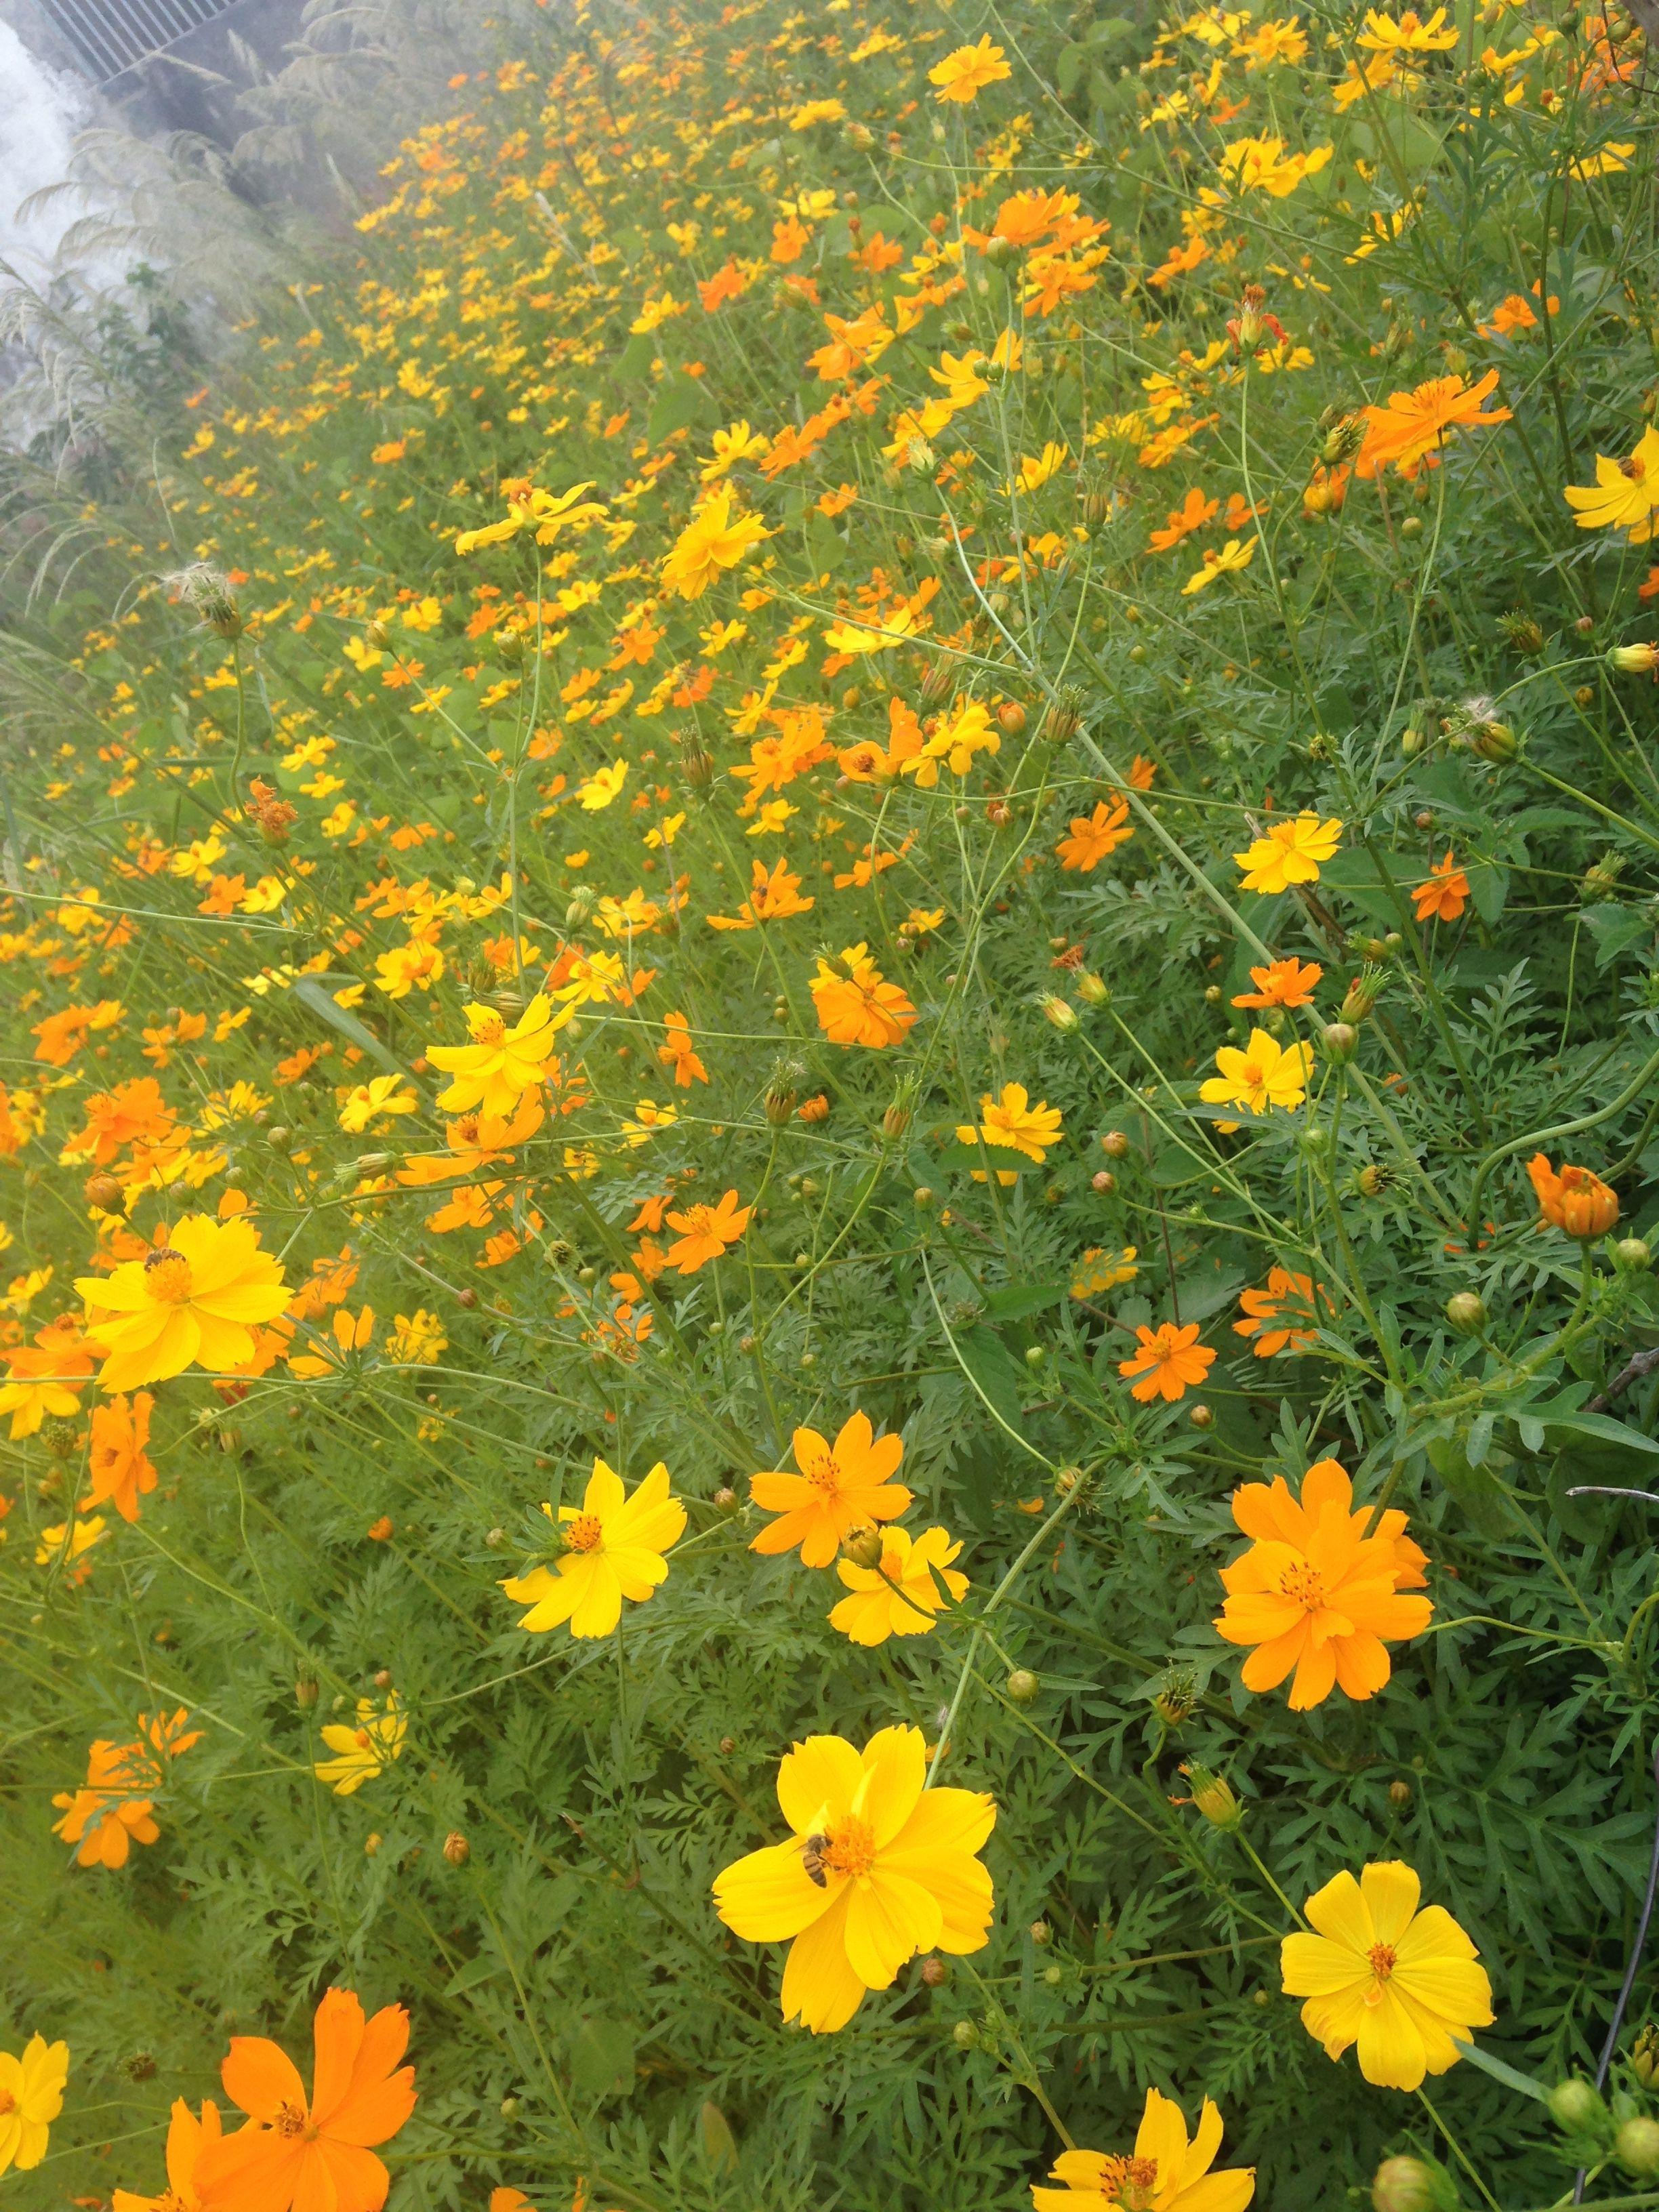 Flower Nature Yellow Garden Tumblr F L O W E R S